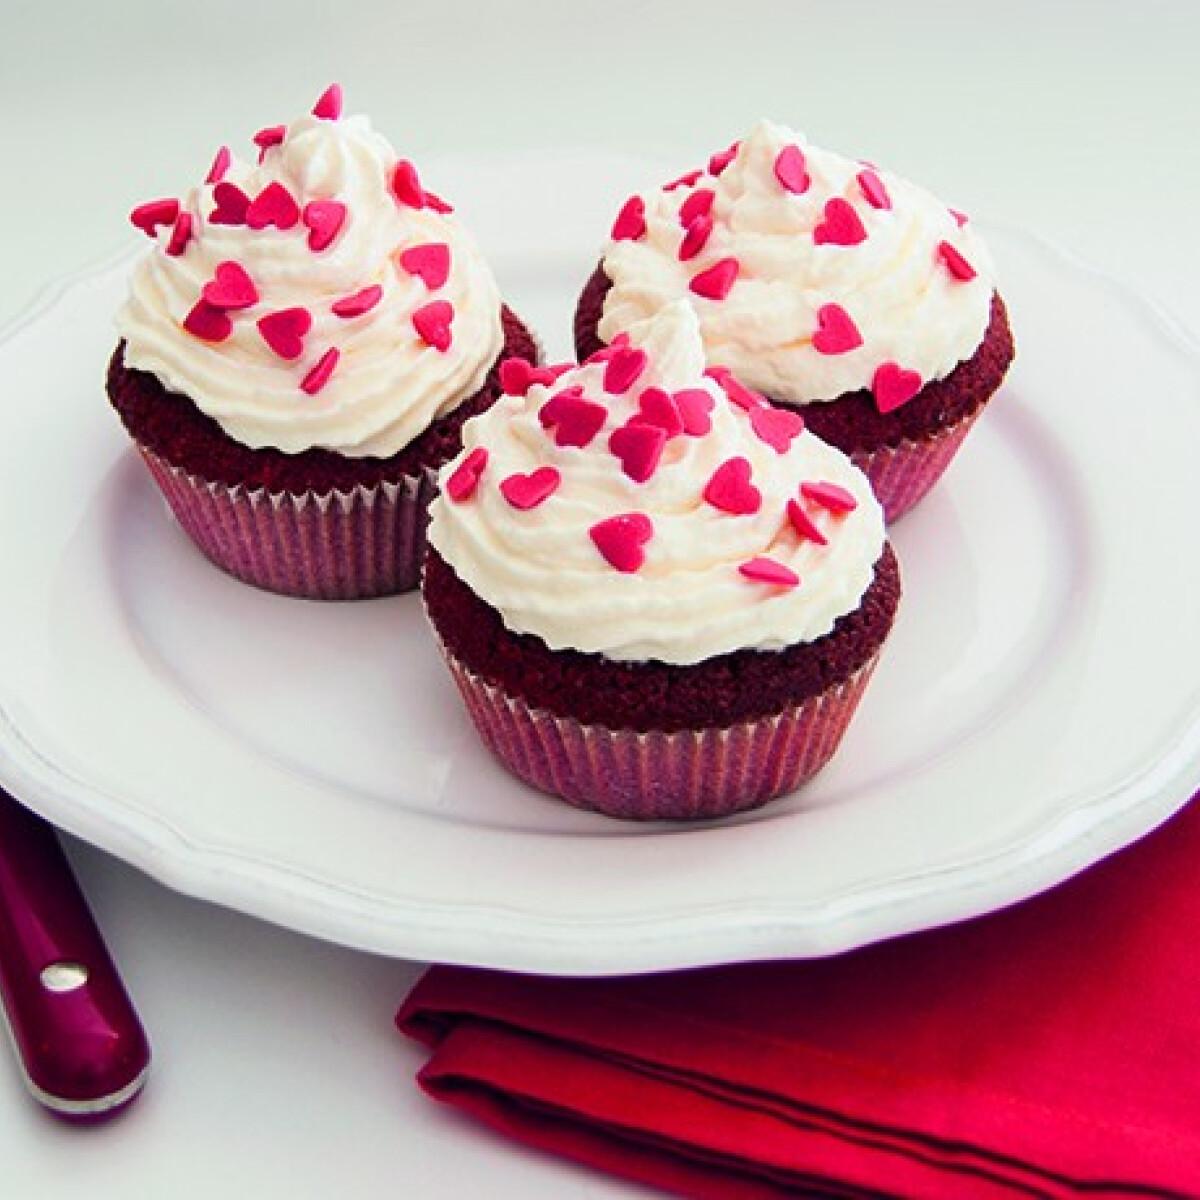 Ezen a képen: Red velvet cupcake Annától